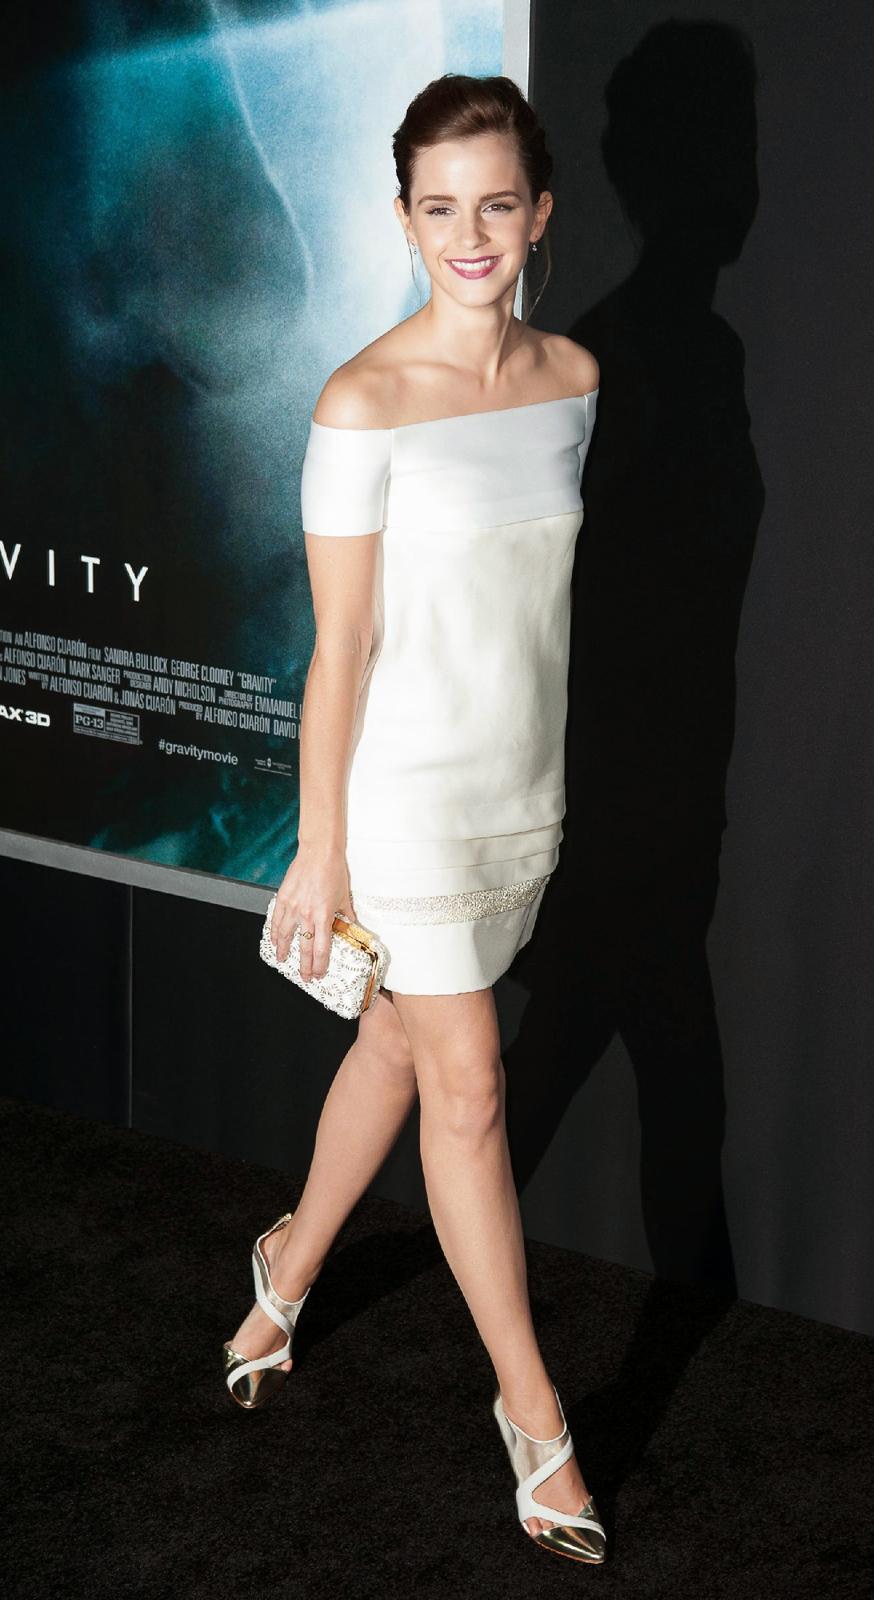 Emma Watson – POTD – Day 13 - Gravity Premiere - October 1, 2012 - NYC